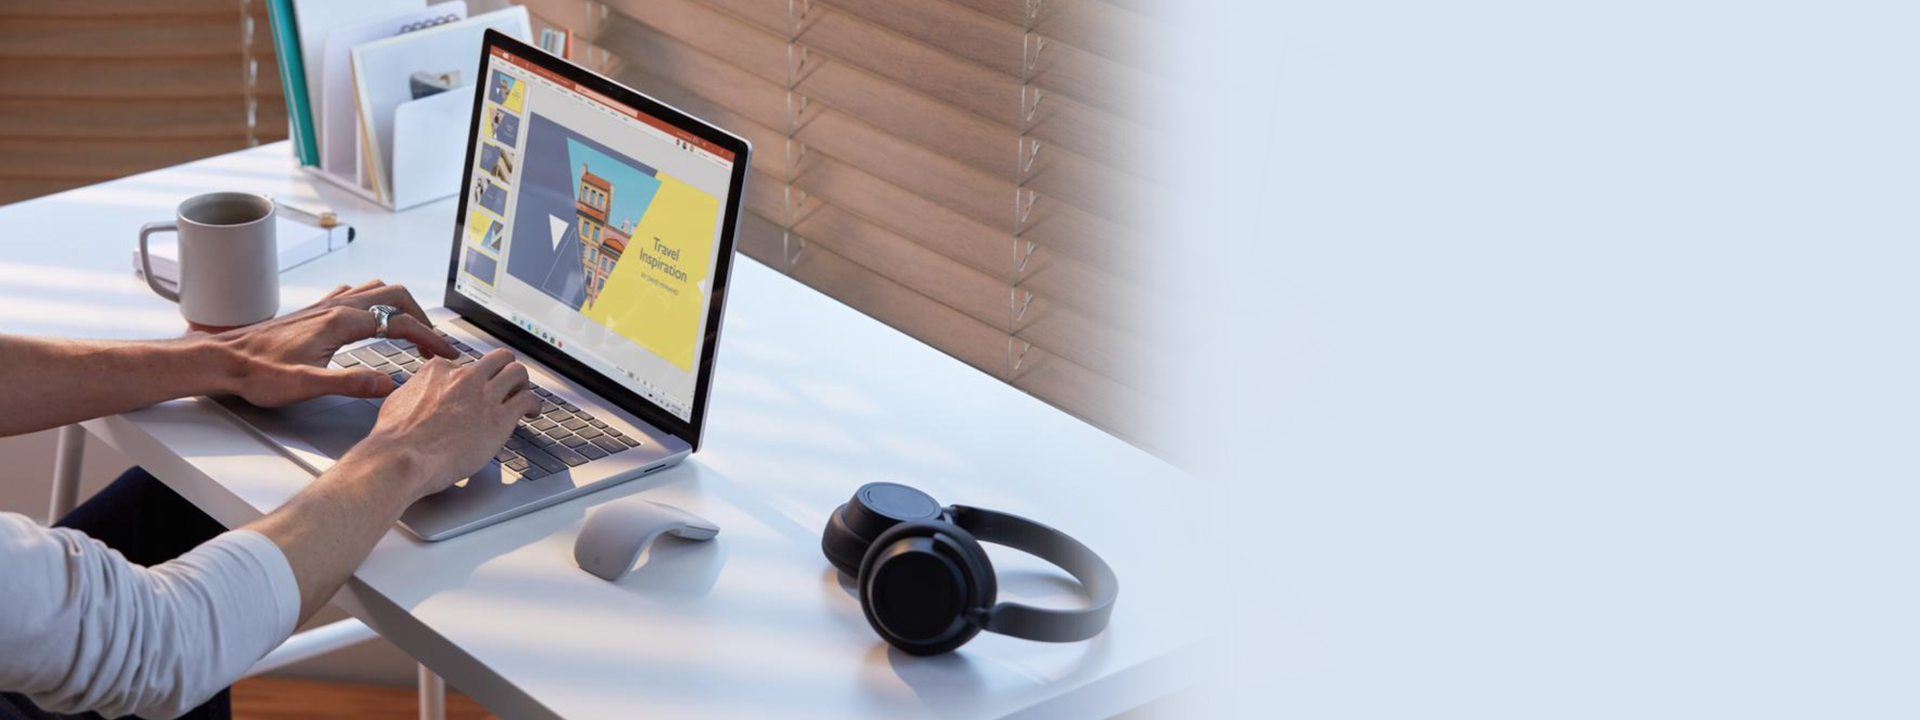 Surface Laptop 3 i Surface Headphones na stole